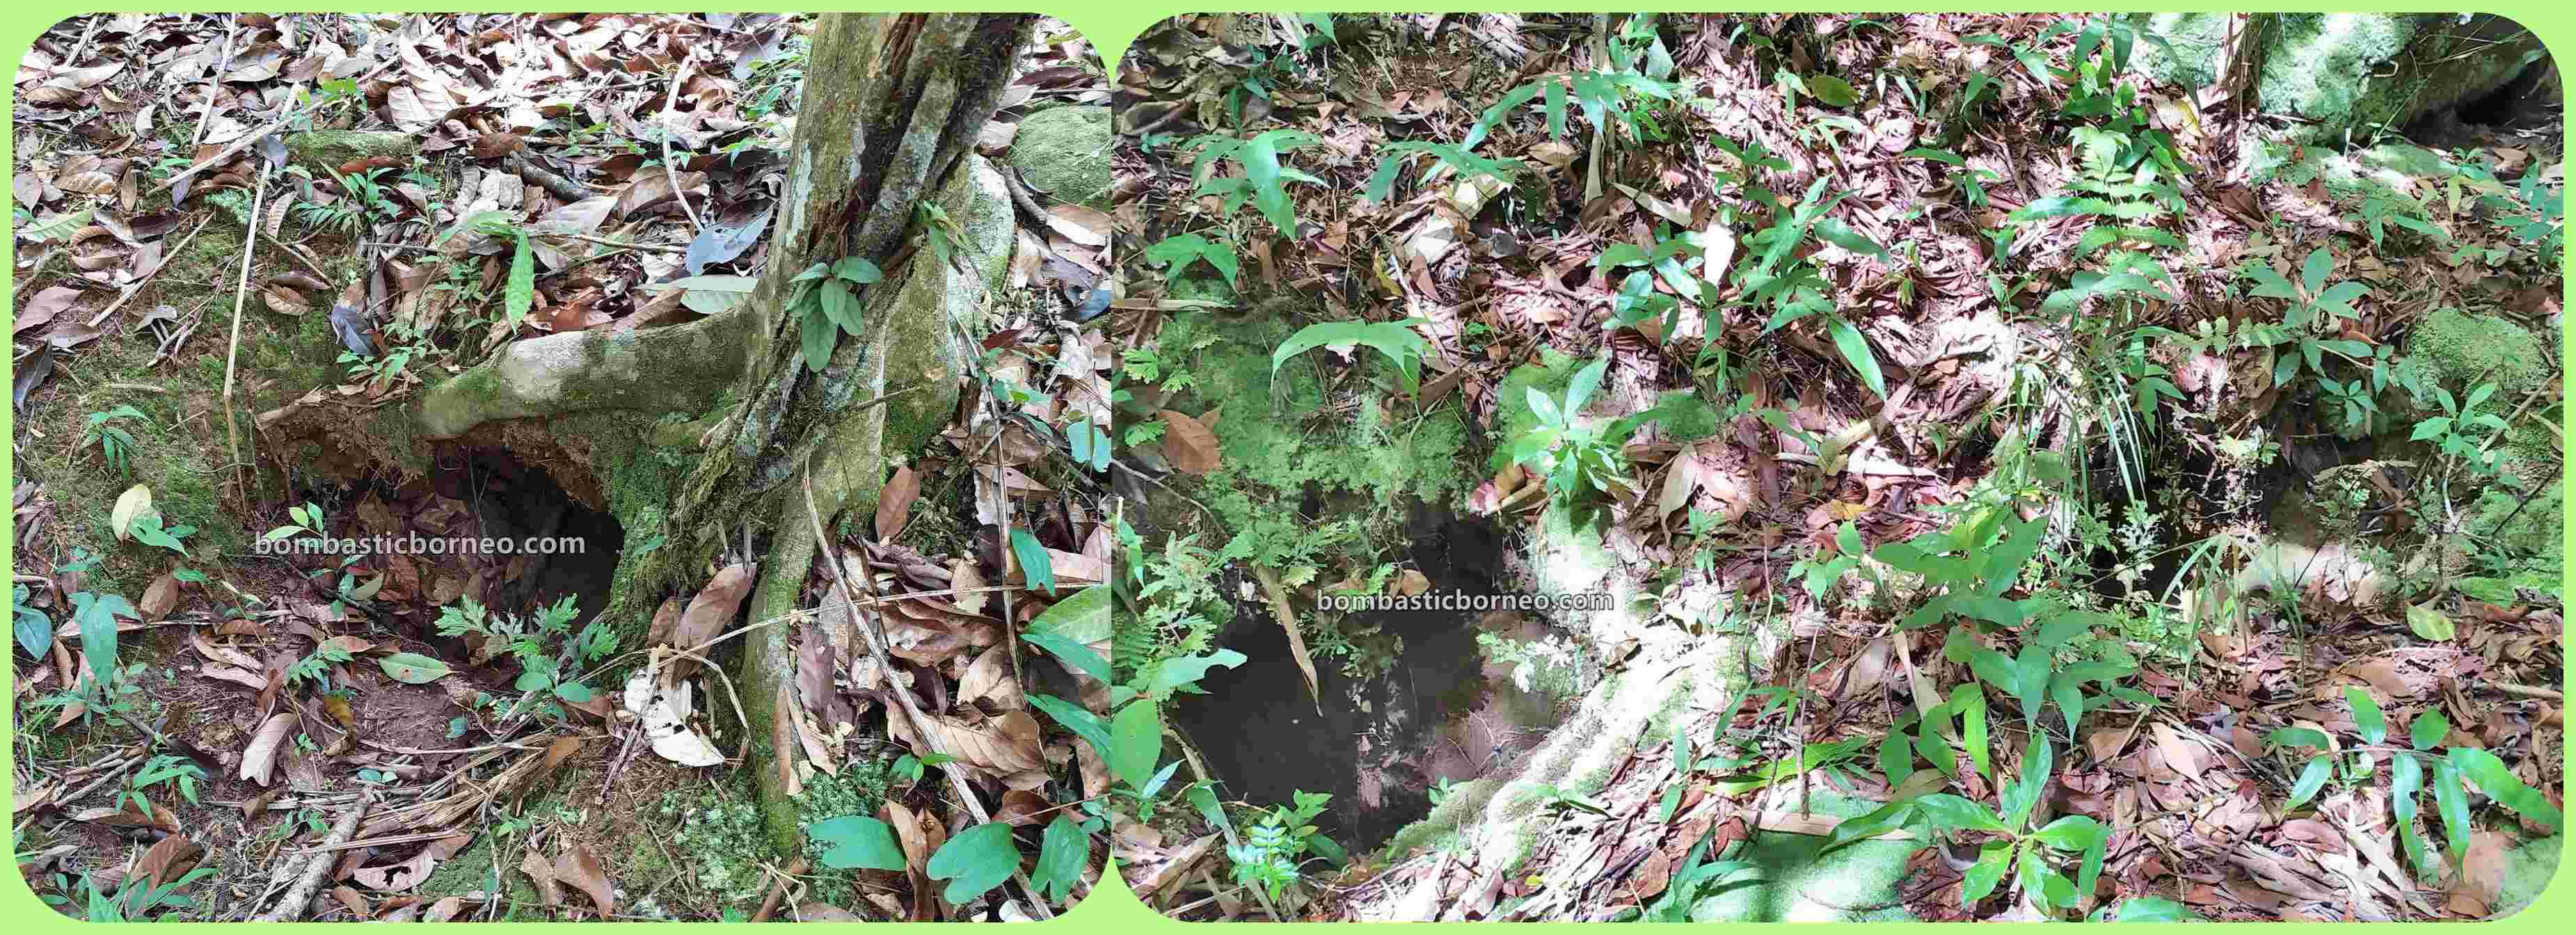 Malaysia, Botanical Garden, Asang Langai homestay, Taman Botani, outdoor, backpackers, destination, exploration, Maligan Highlands, Lun Bawang, tourist attraction, Borneo, 探索婆罗洲砂拉越, 马来西亚巴卡拉兰,